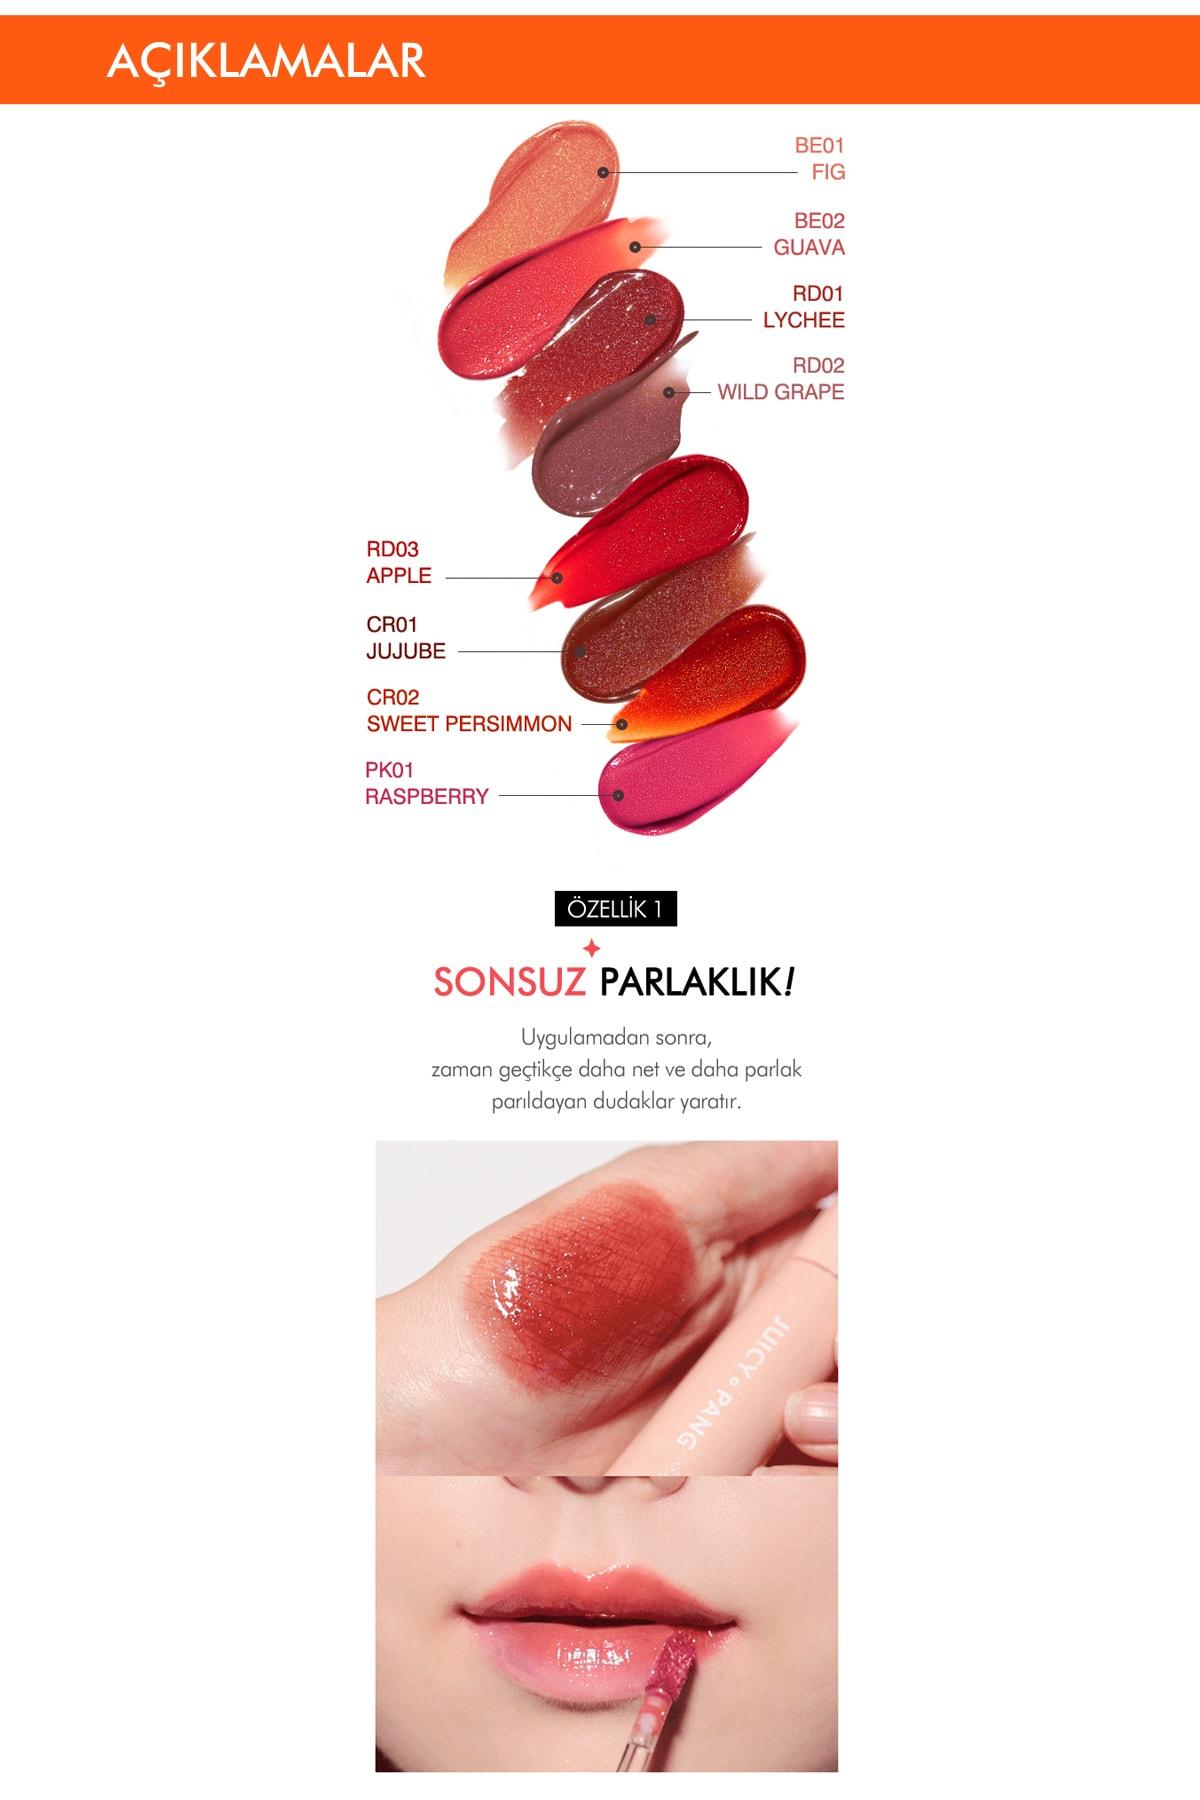 Missha Işıltı&Dolgunluk Veren Parlak Gloss Tint APIEU Juicy-Pang Sparkling Tint CR02 3